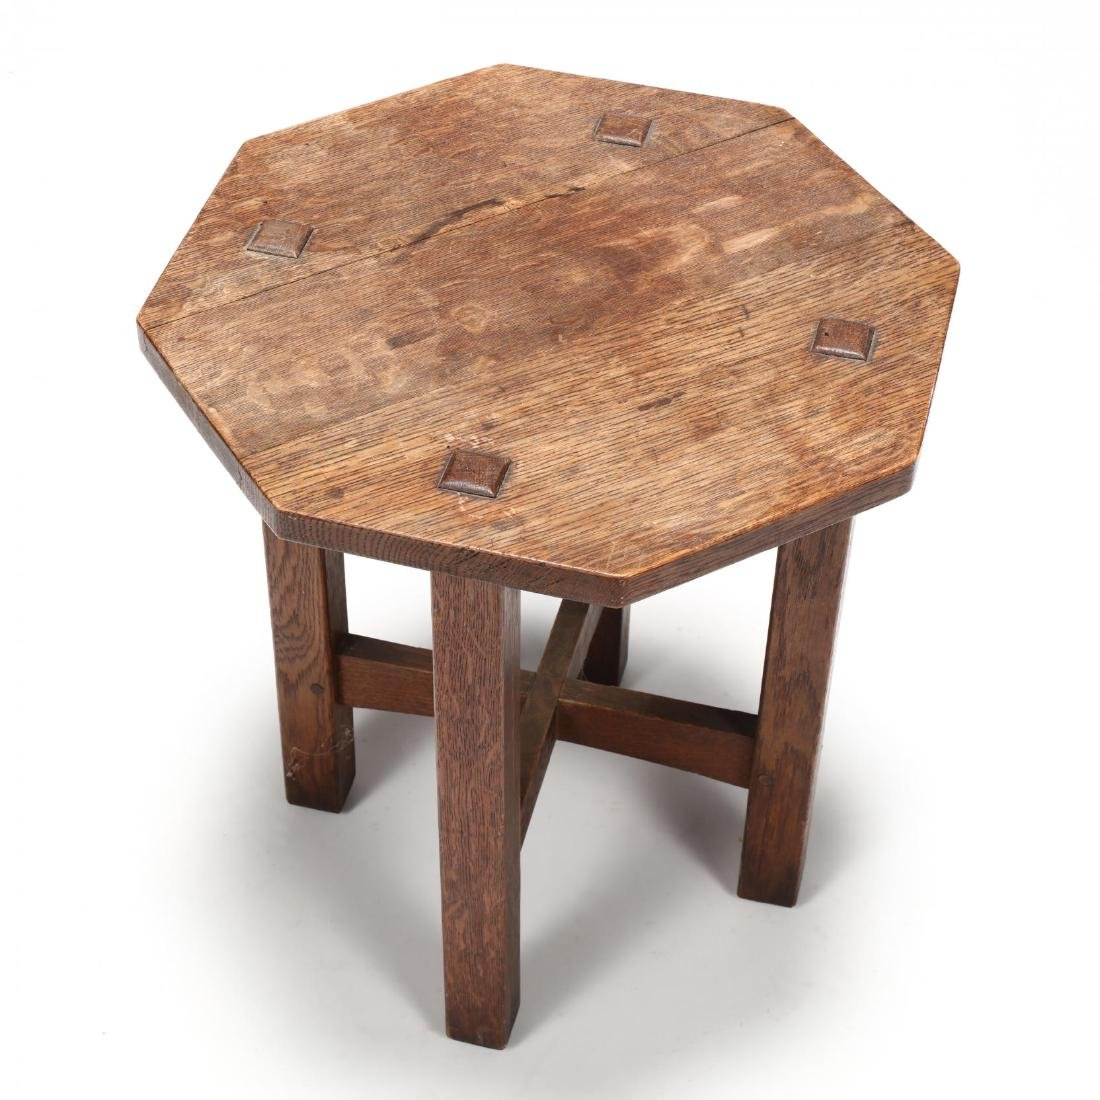 L. J. G. Stickley, Misson Oak Low Table - 2